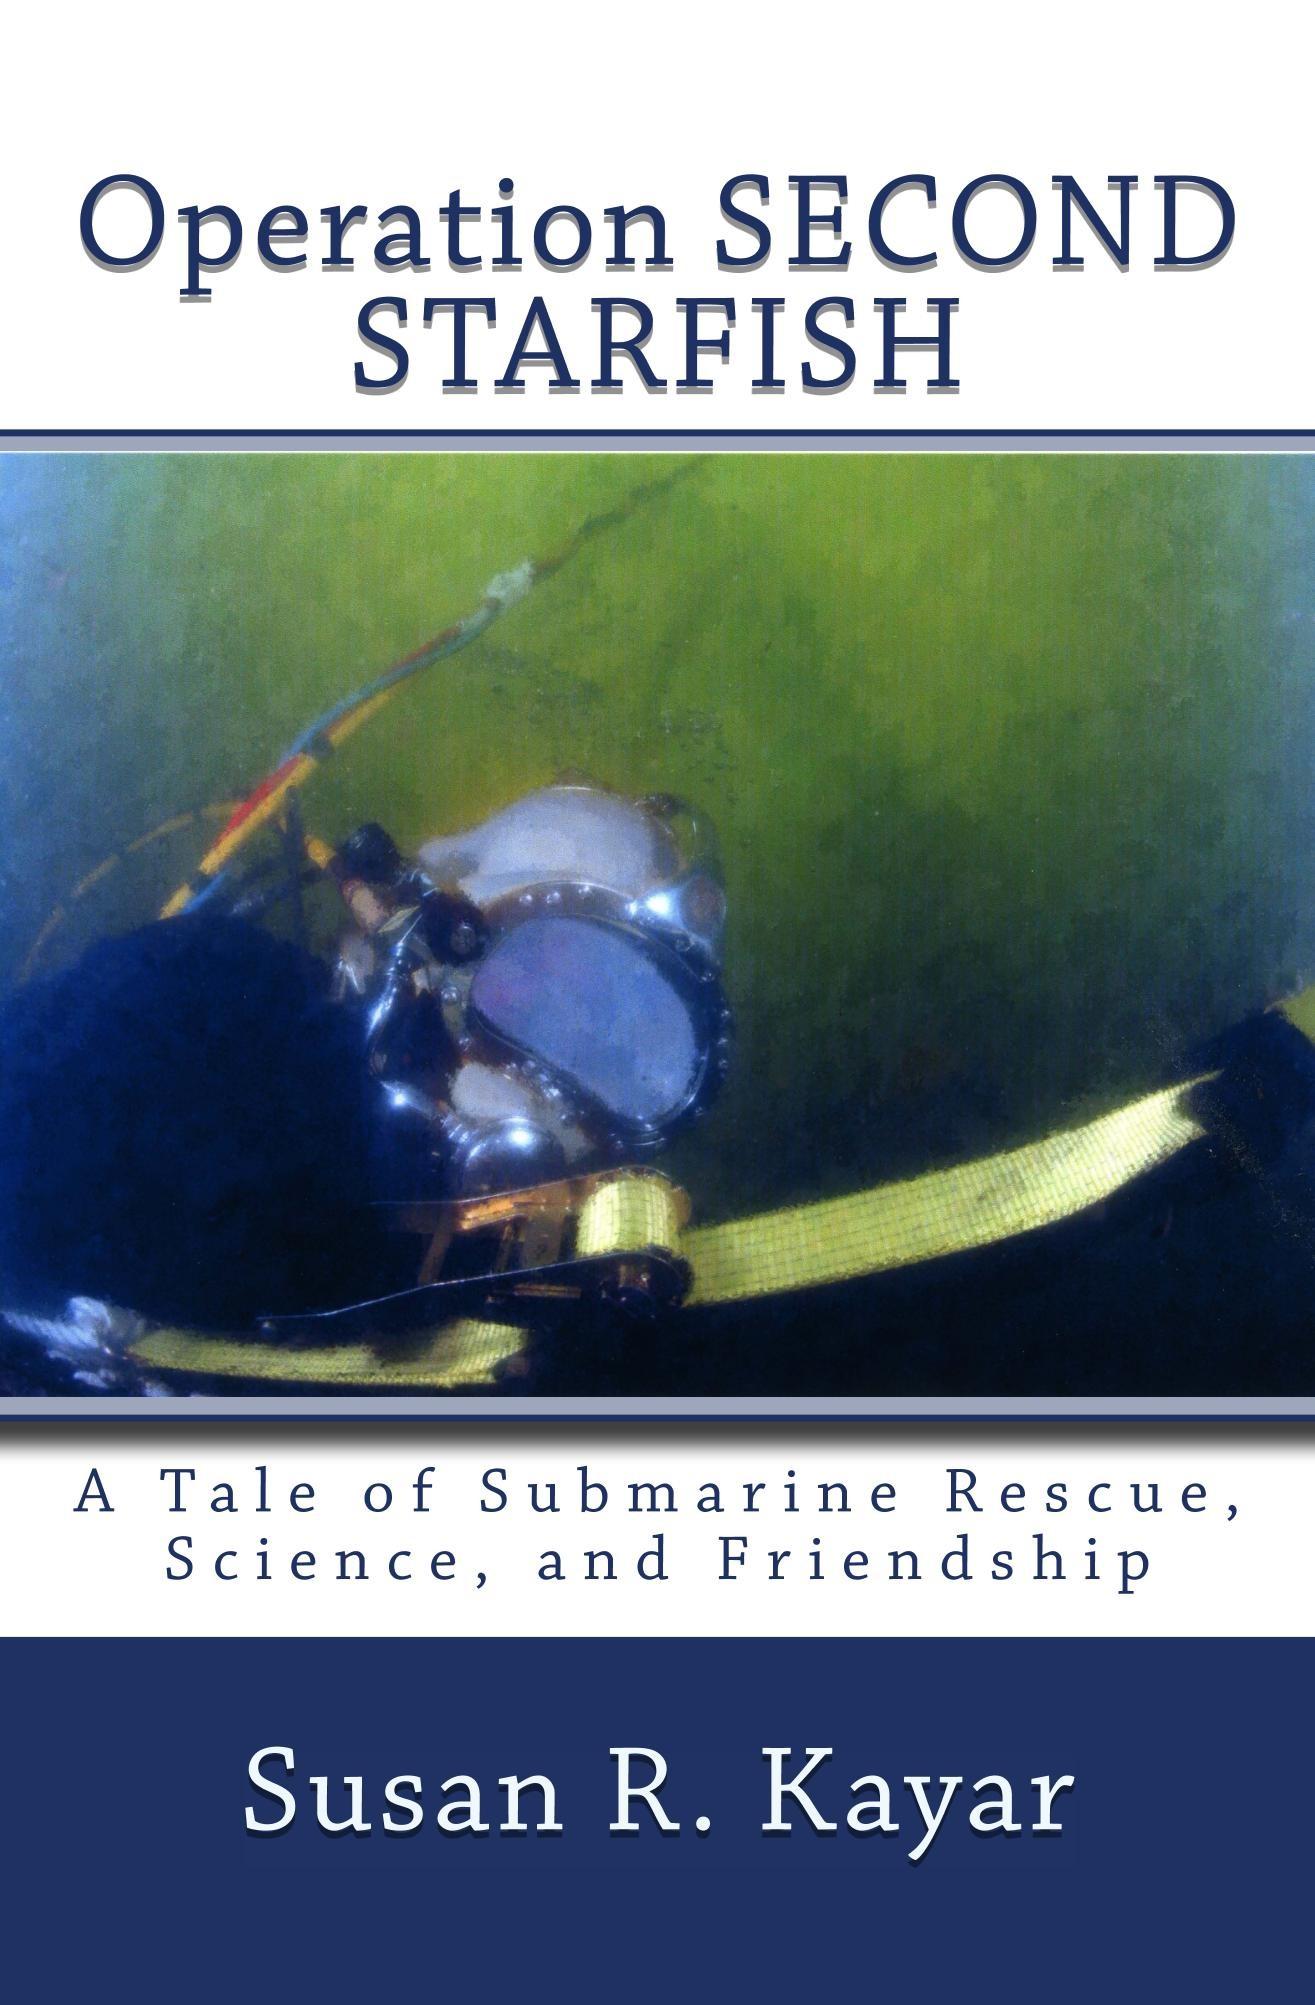 Operation SECOND STARFISH